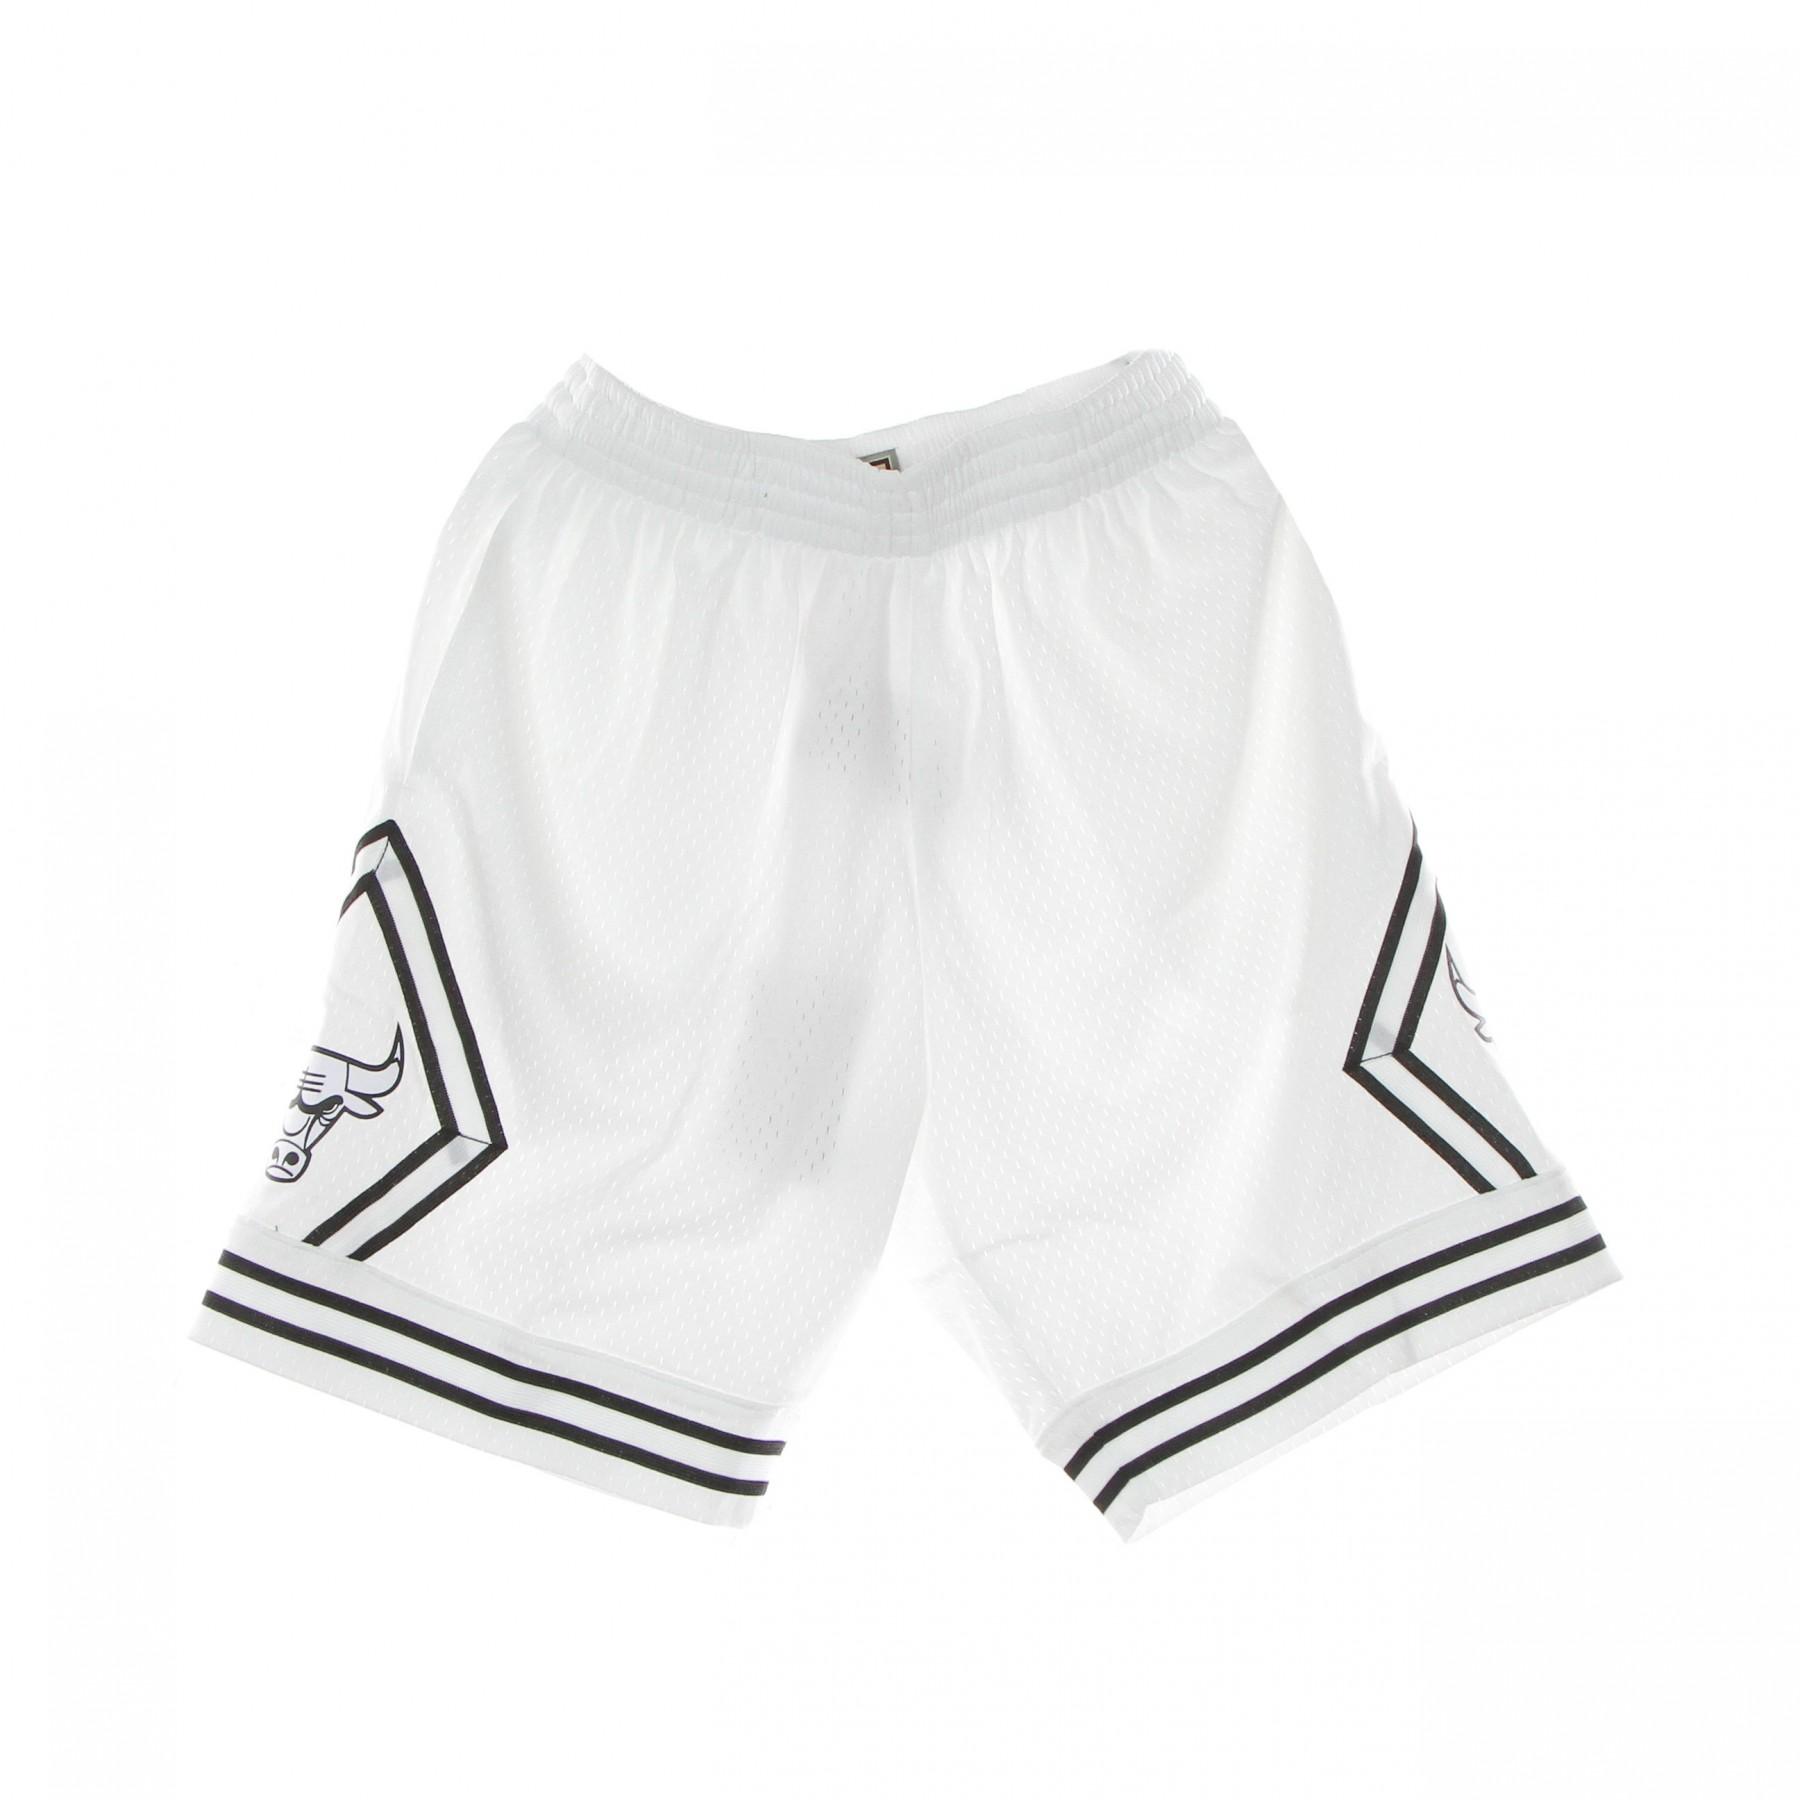 pantaloncino basket uomo nba white black swingman shorts hardwood classics chibul XL